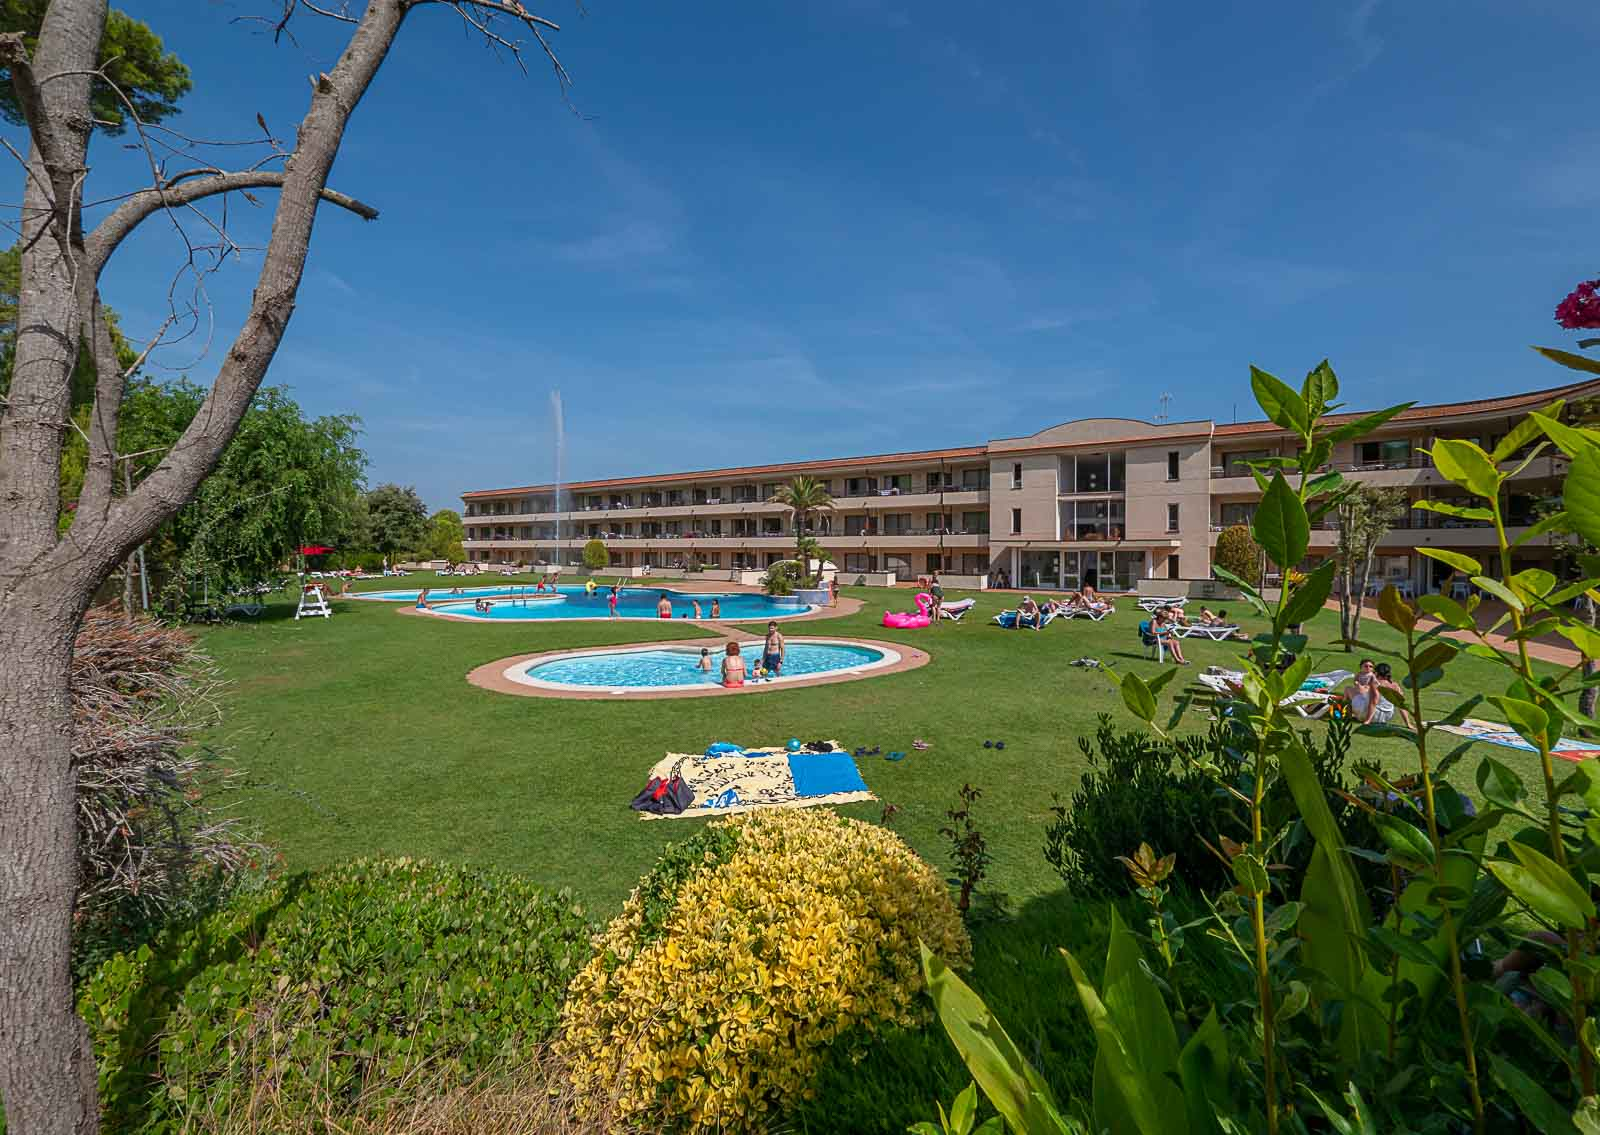 ahgolfbeach Golf Beach Pals _vista jardines